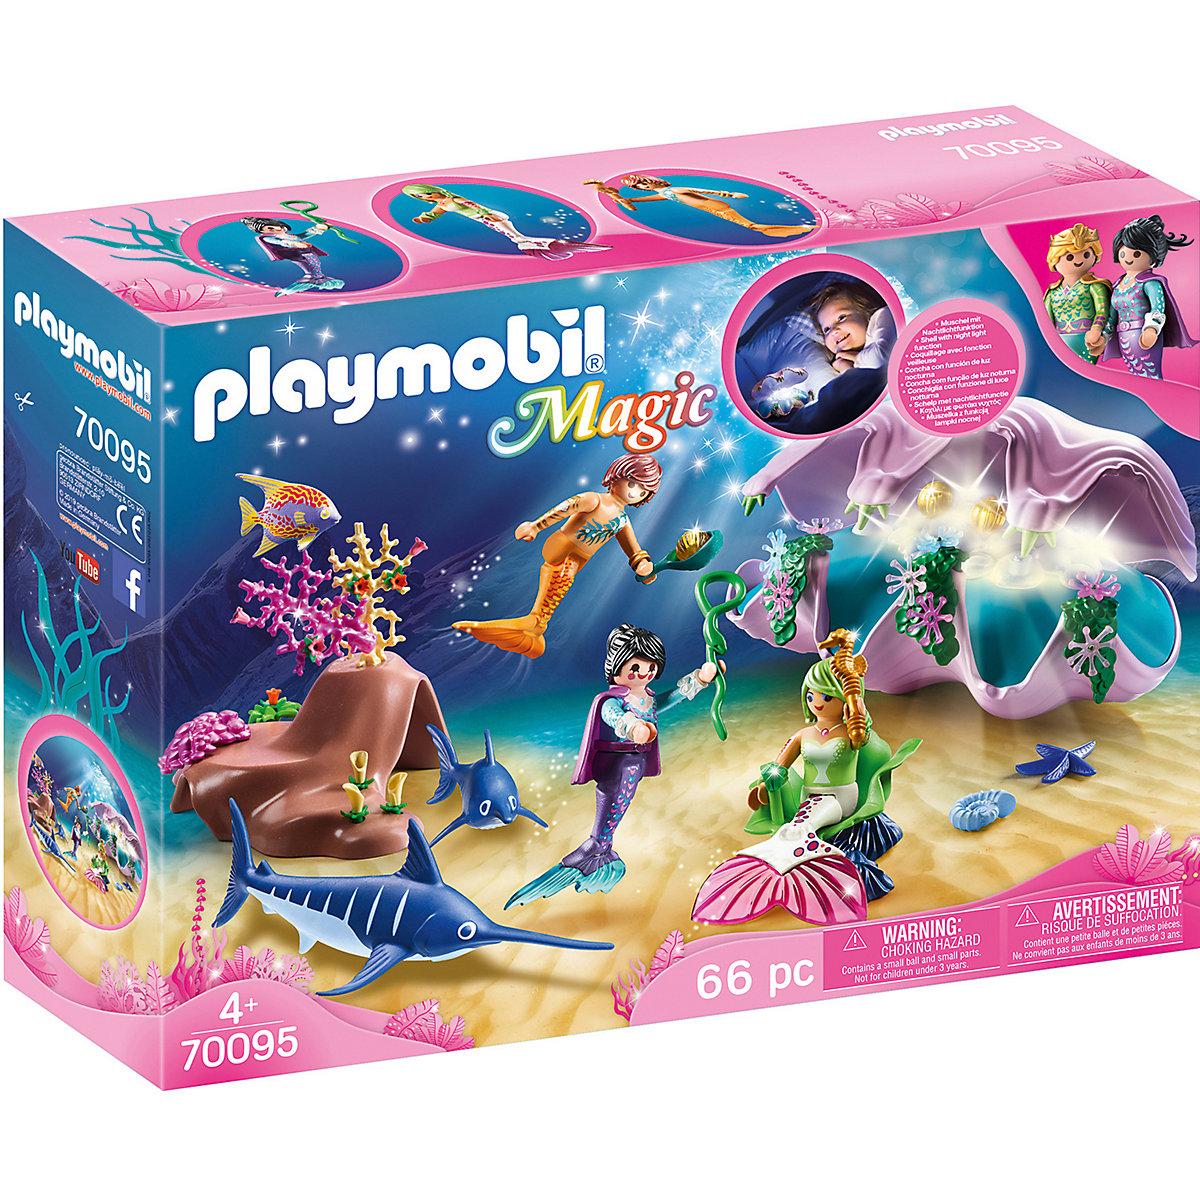 playmobil® 70095 nachtlicht perlenmuschel playmobil magic